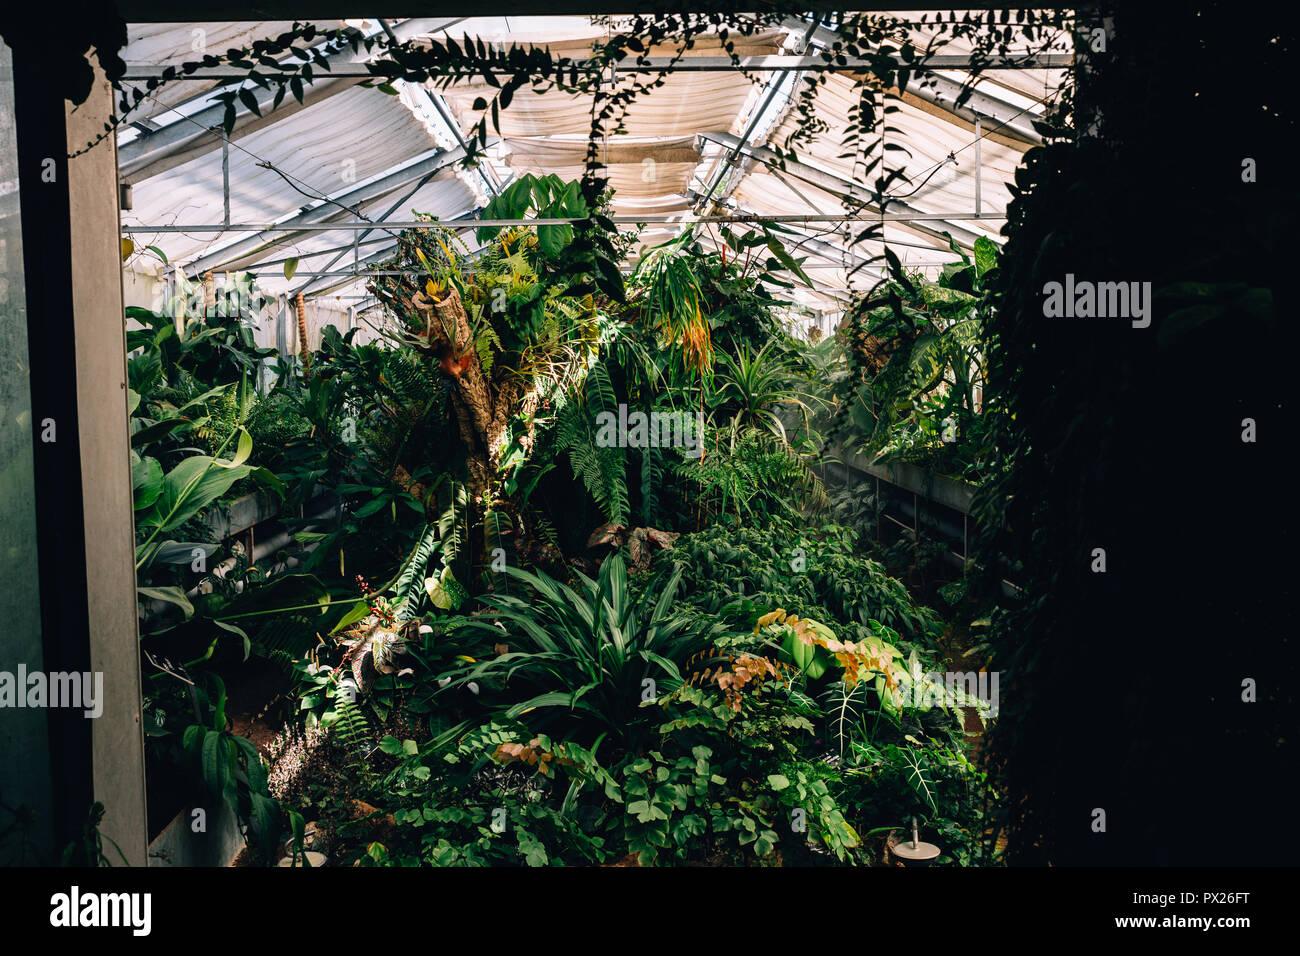 Botanischer Garten, Lyon, Frankreich, 2018 Stockbild